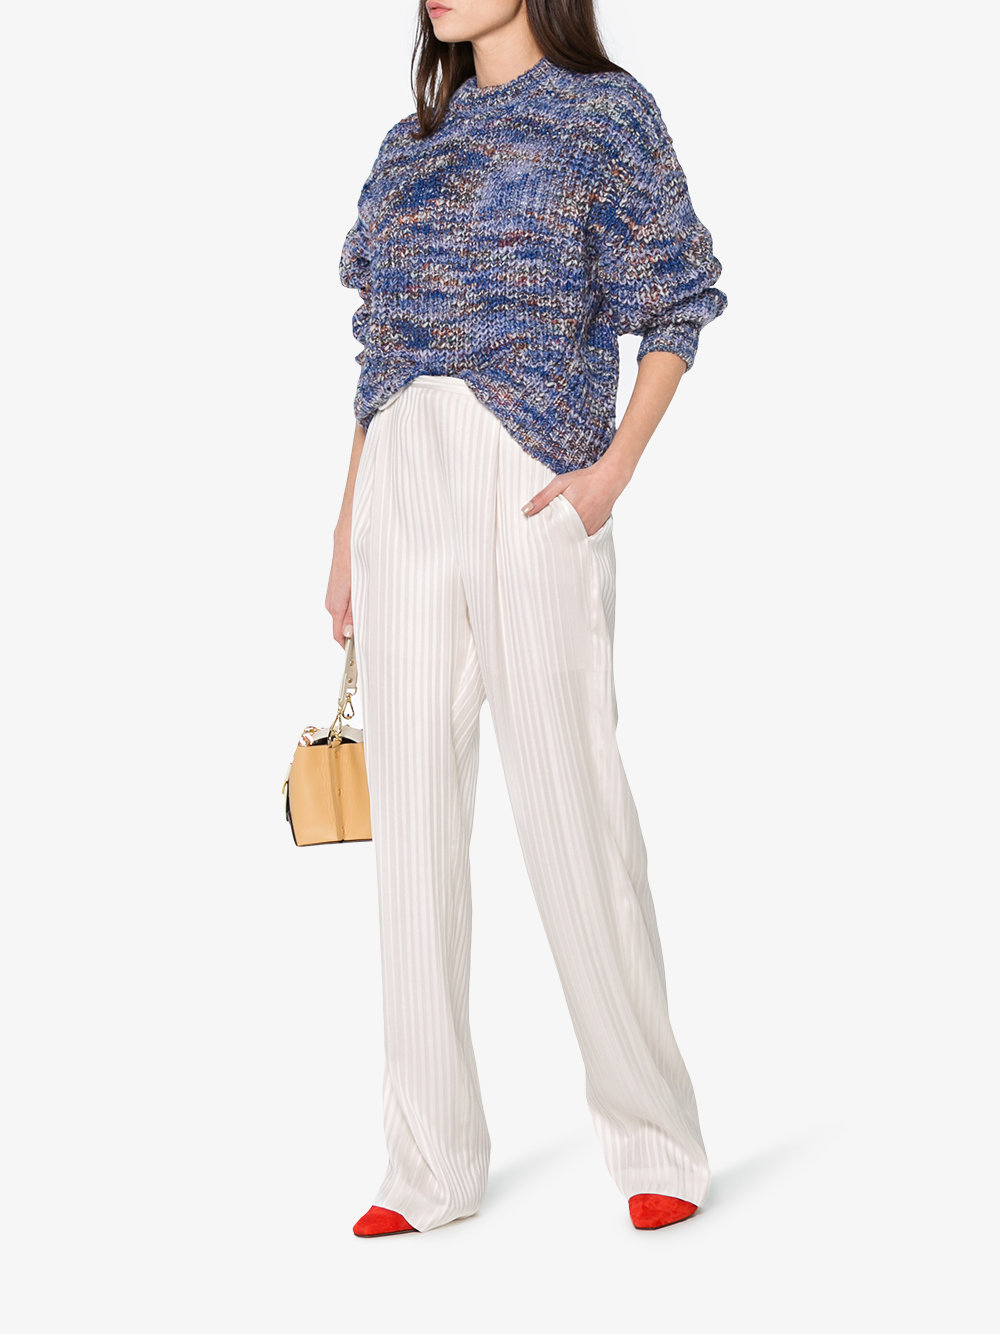 pantalone bianco in seta Jacquard a vita alta con elastico in vita STELLA MC CARTNEY | Pantaloni | 477400-SKA119501